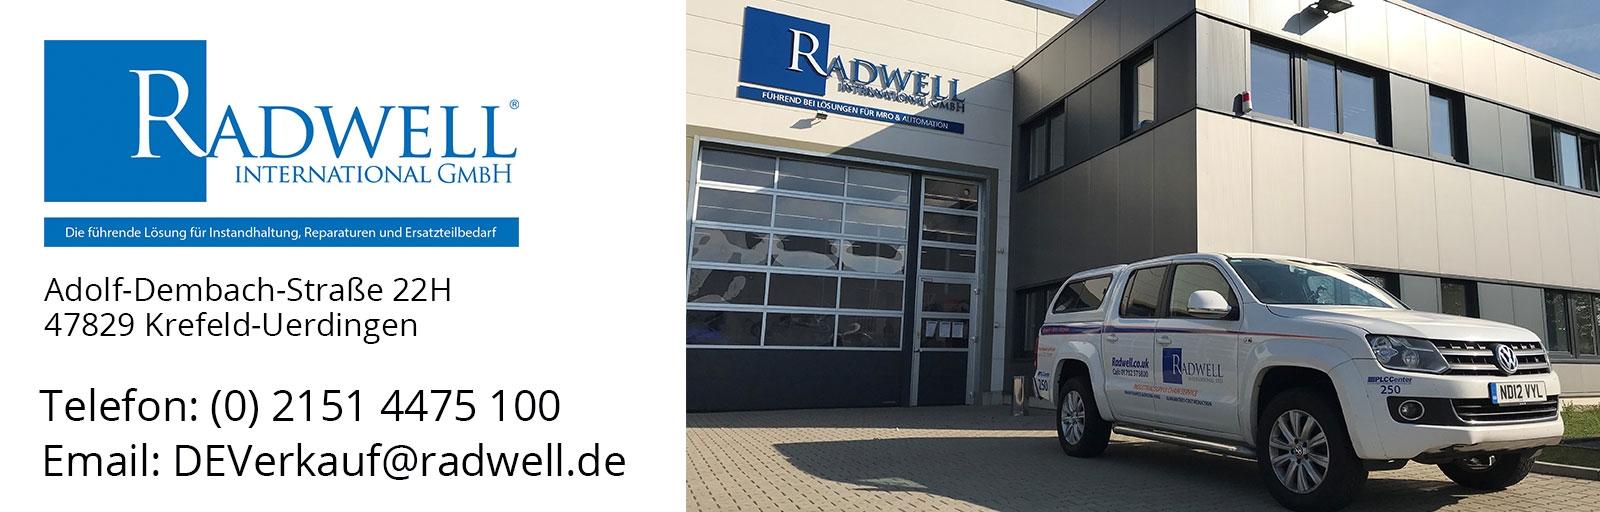 Radwell International Germany GmbH